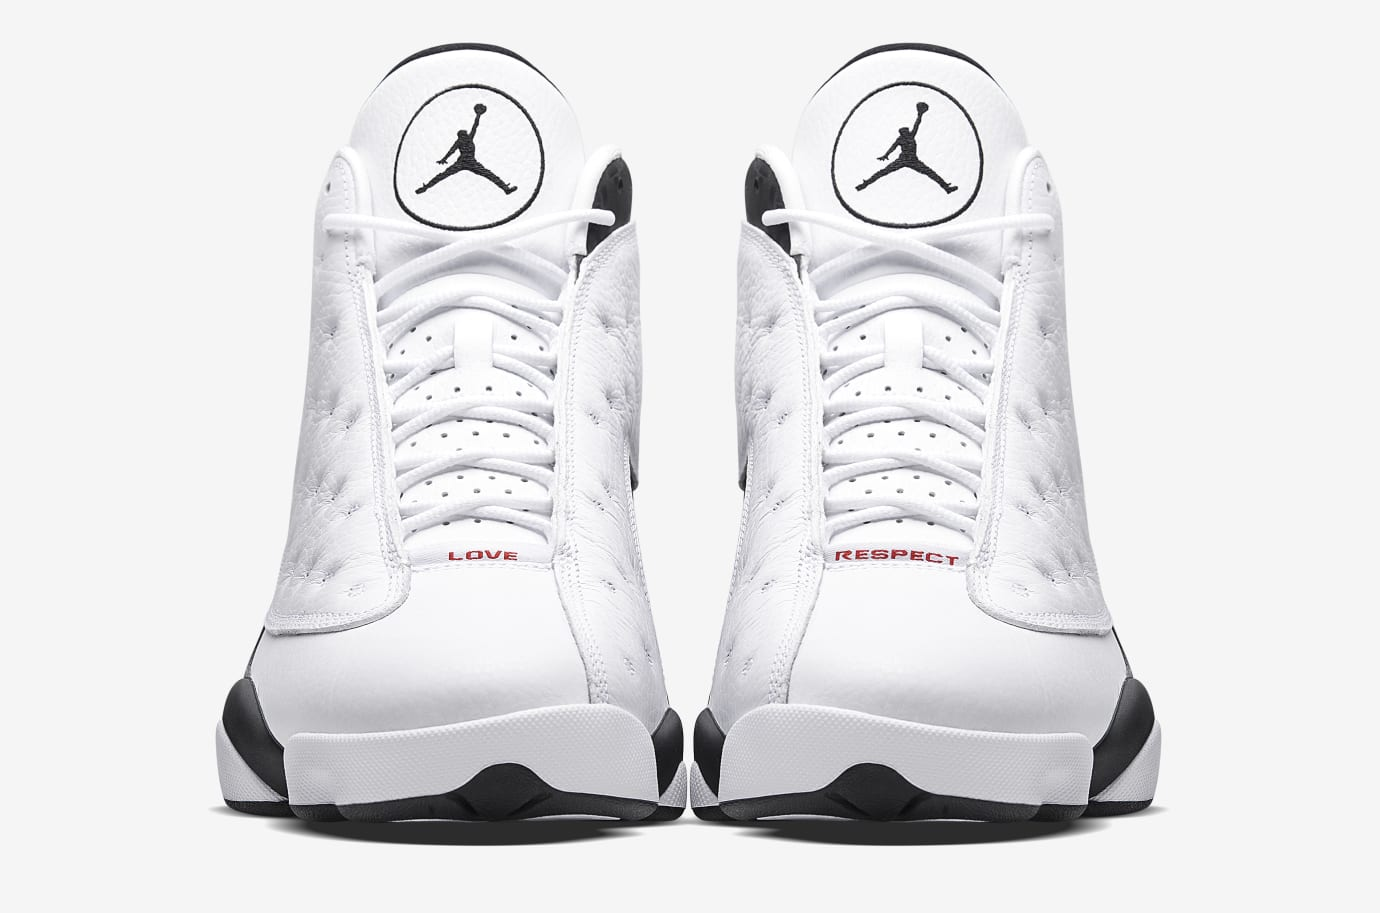 9fb09acebfc8 Image via Nike Air Jordan 13 Love Respect White Front